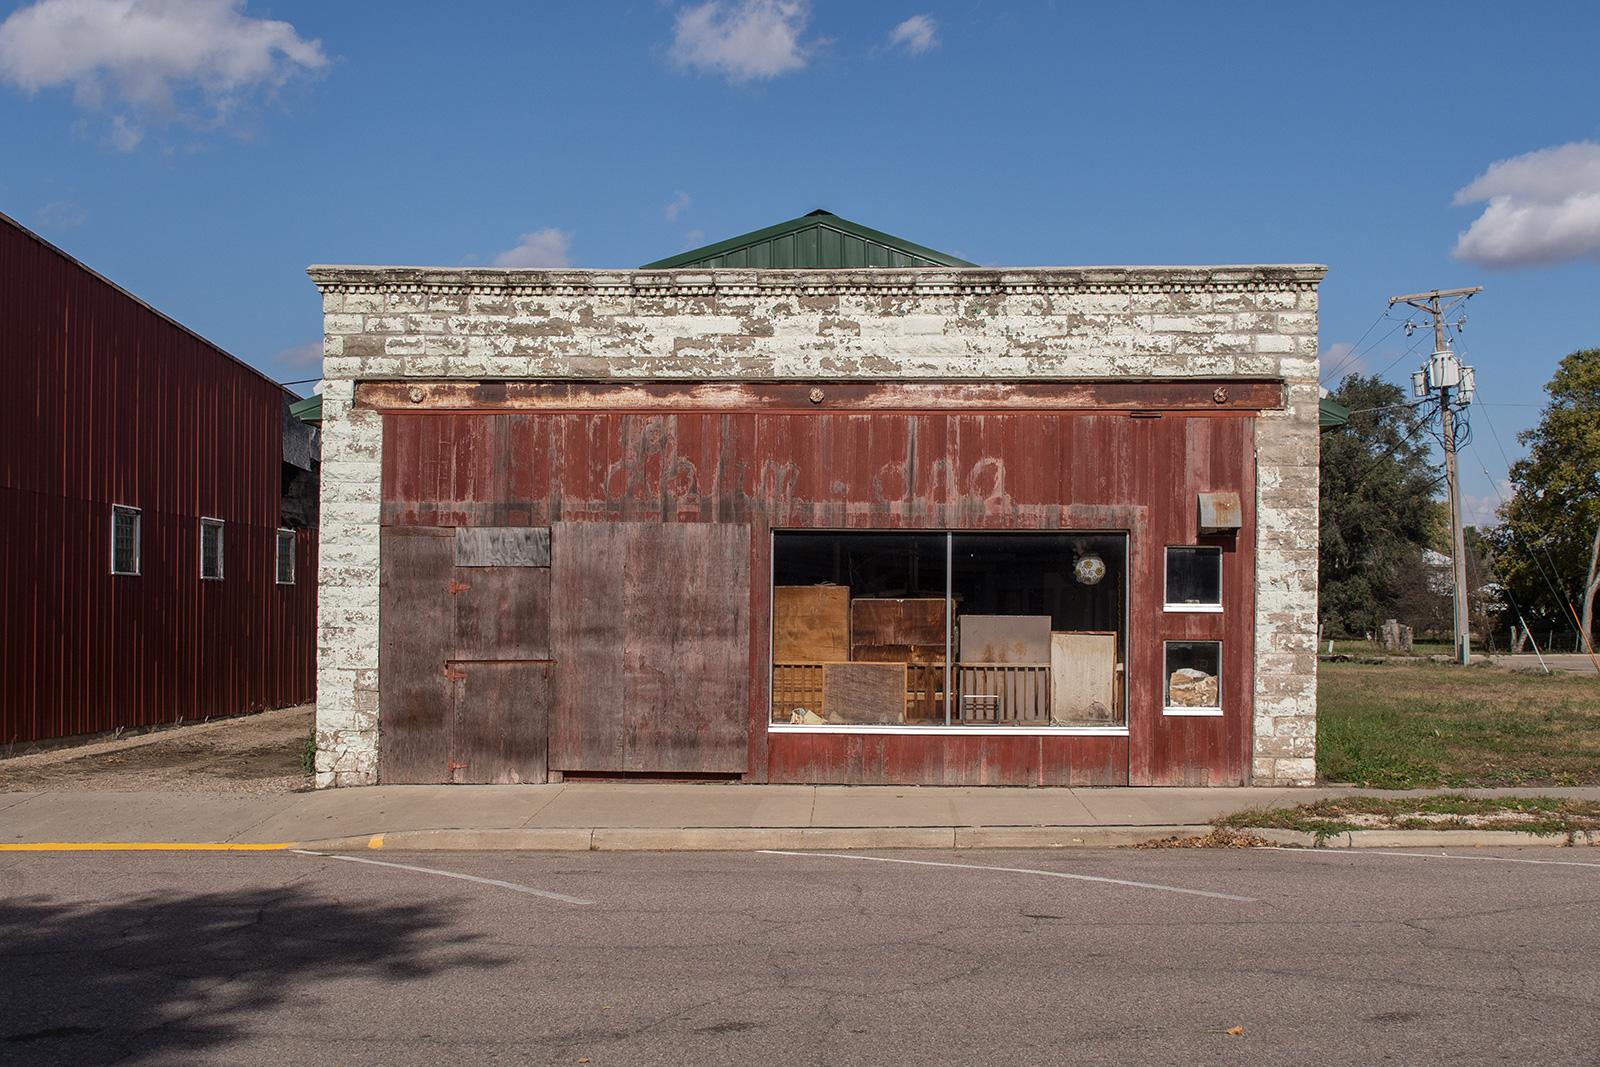 Correctionville, Iowa